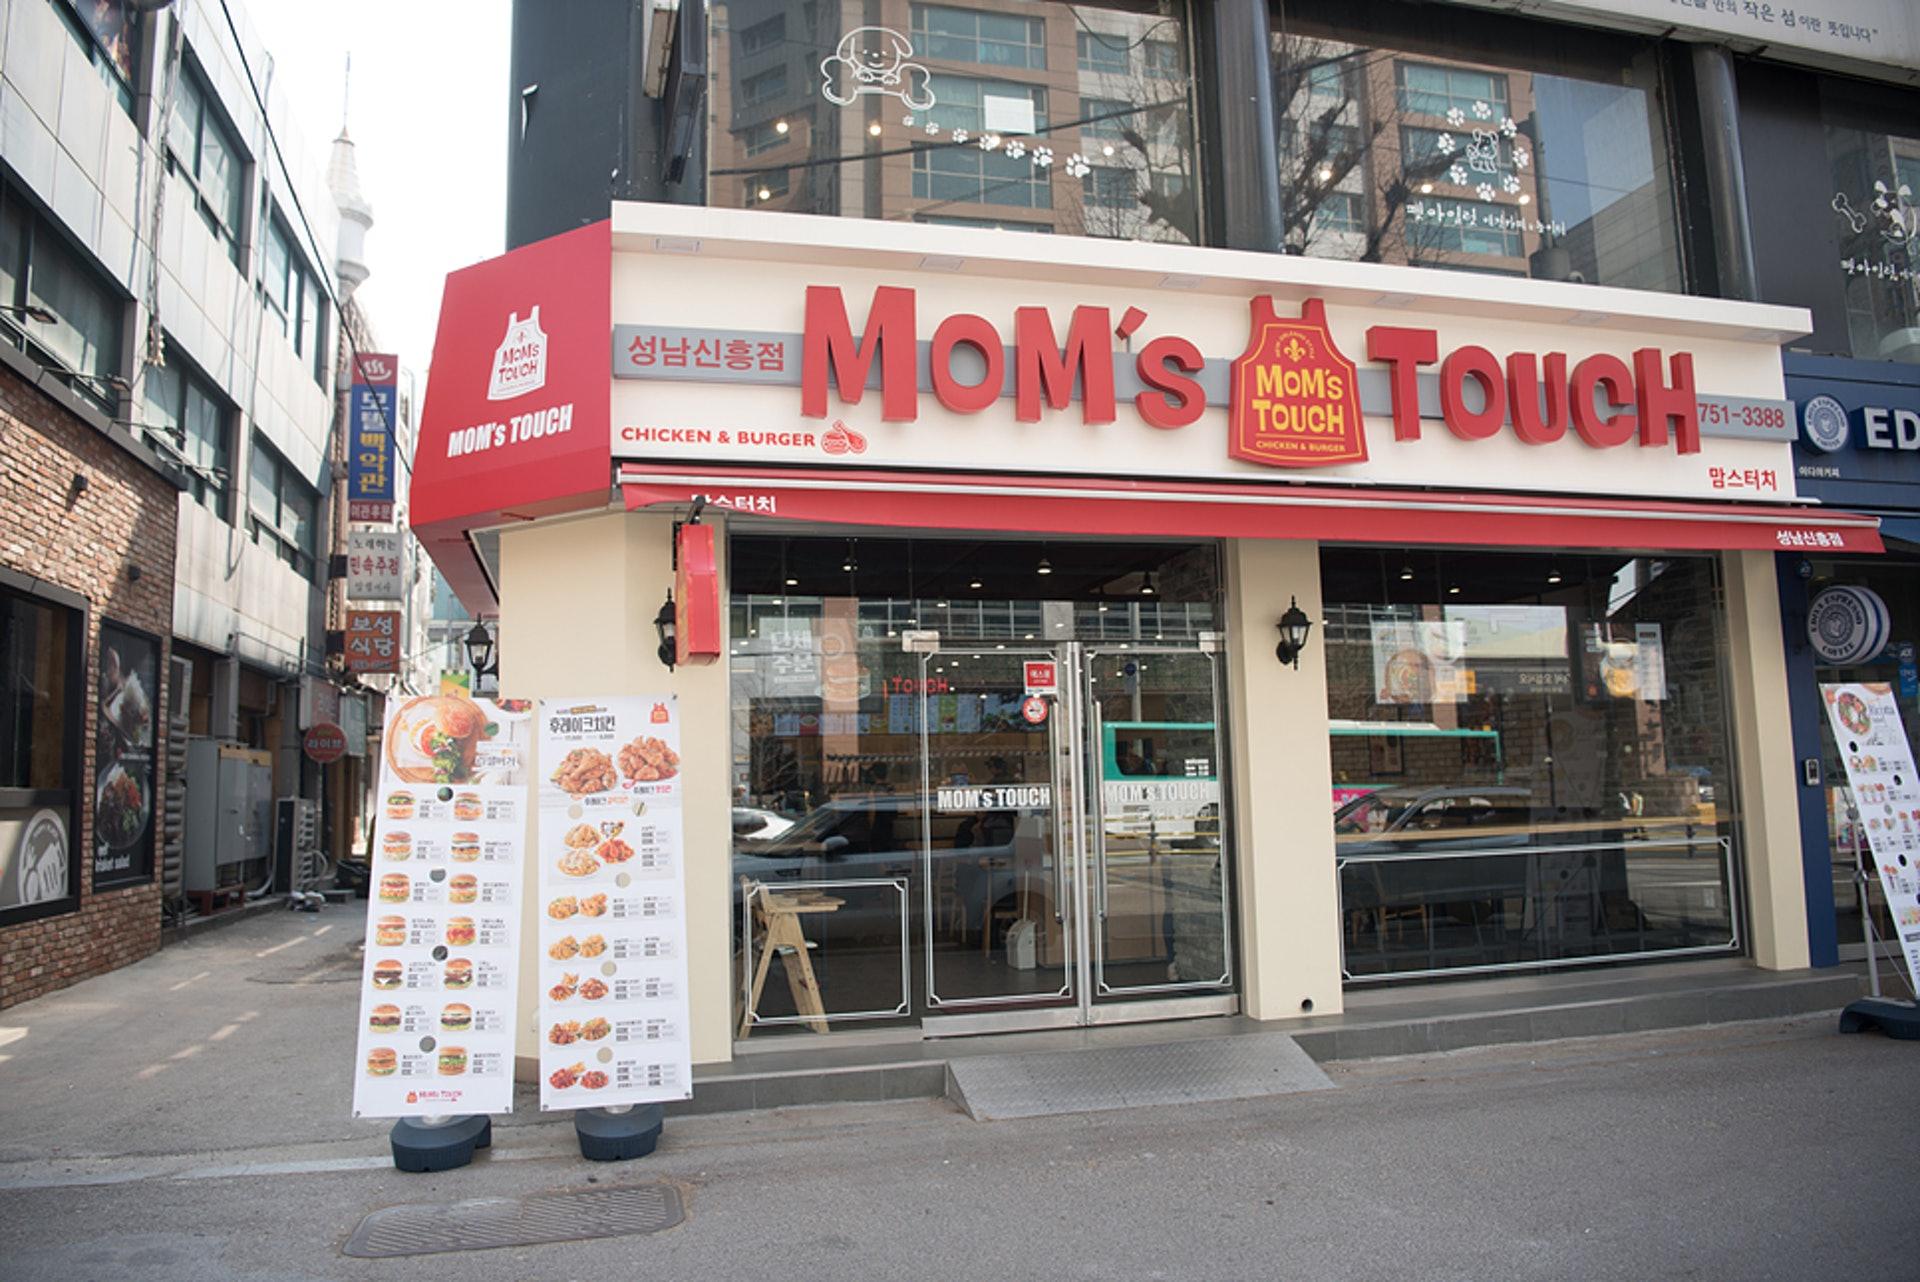 MOM's TOUCH是韩国有名的快餐店,没吃过的一定要试试! (图片来源︰Naver Blog)